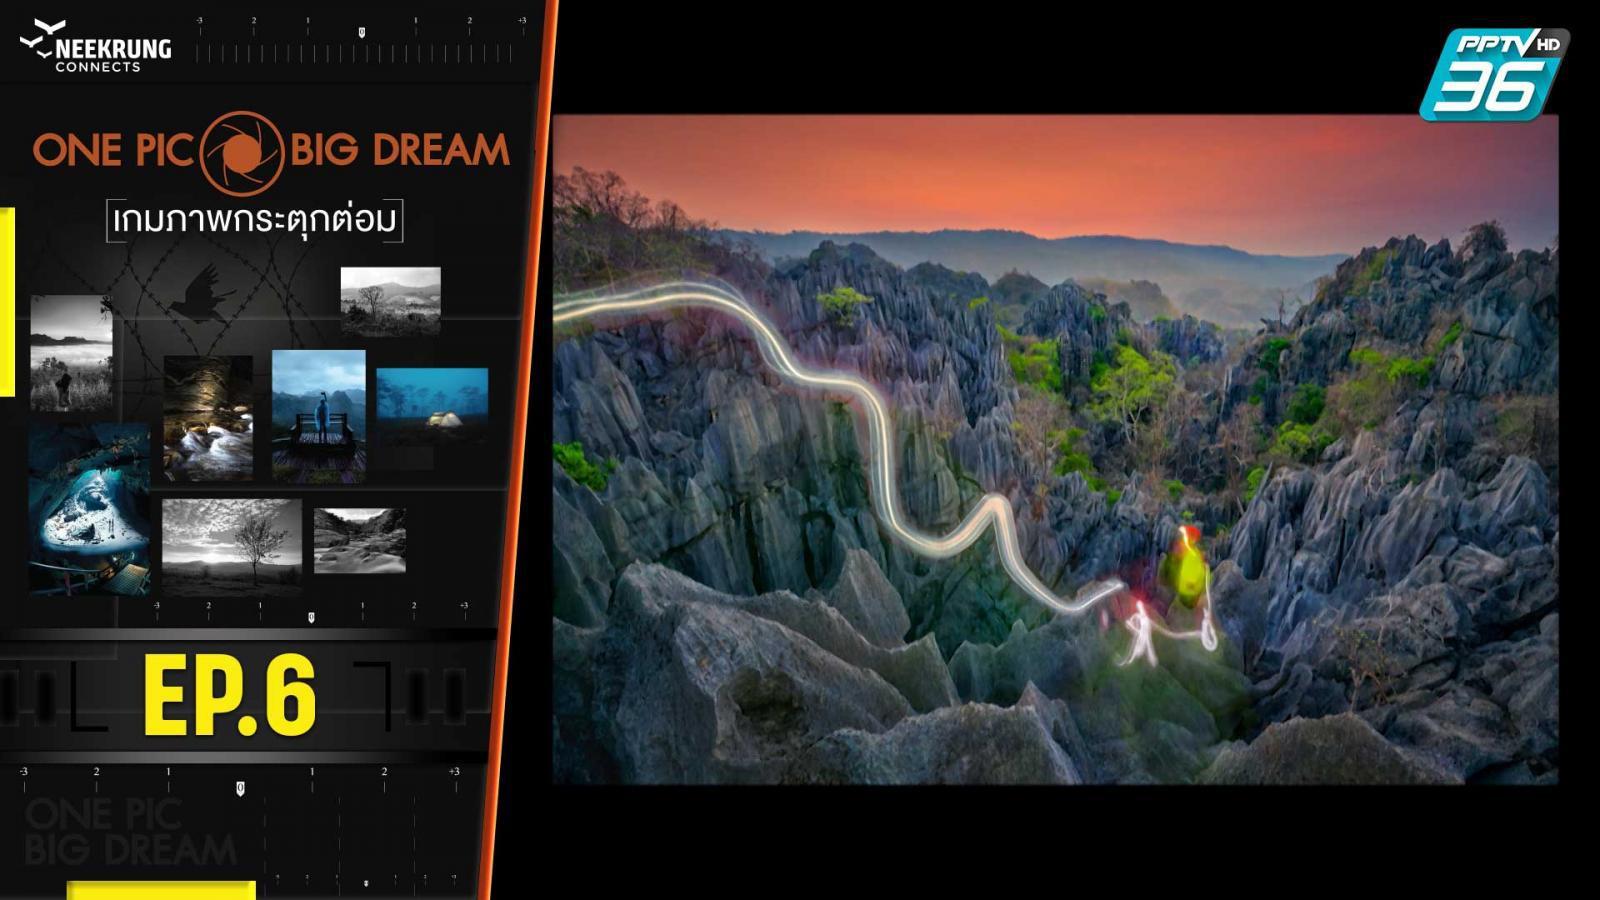 ONE PIC BIG DREAM เกมภาพกระตุกต่อม EP.6 | 5 ส.ค. 63 | PPTV HD 36